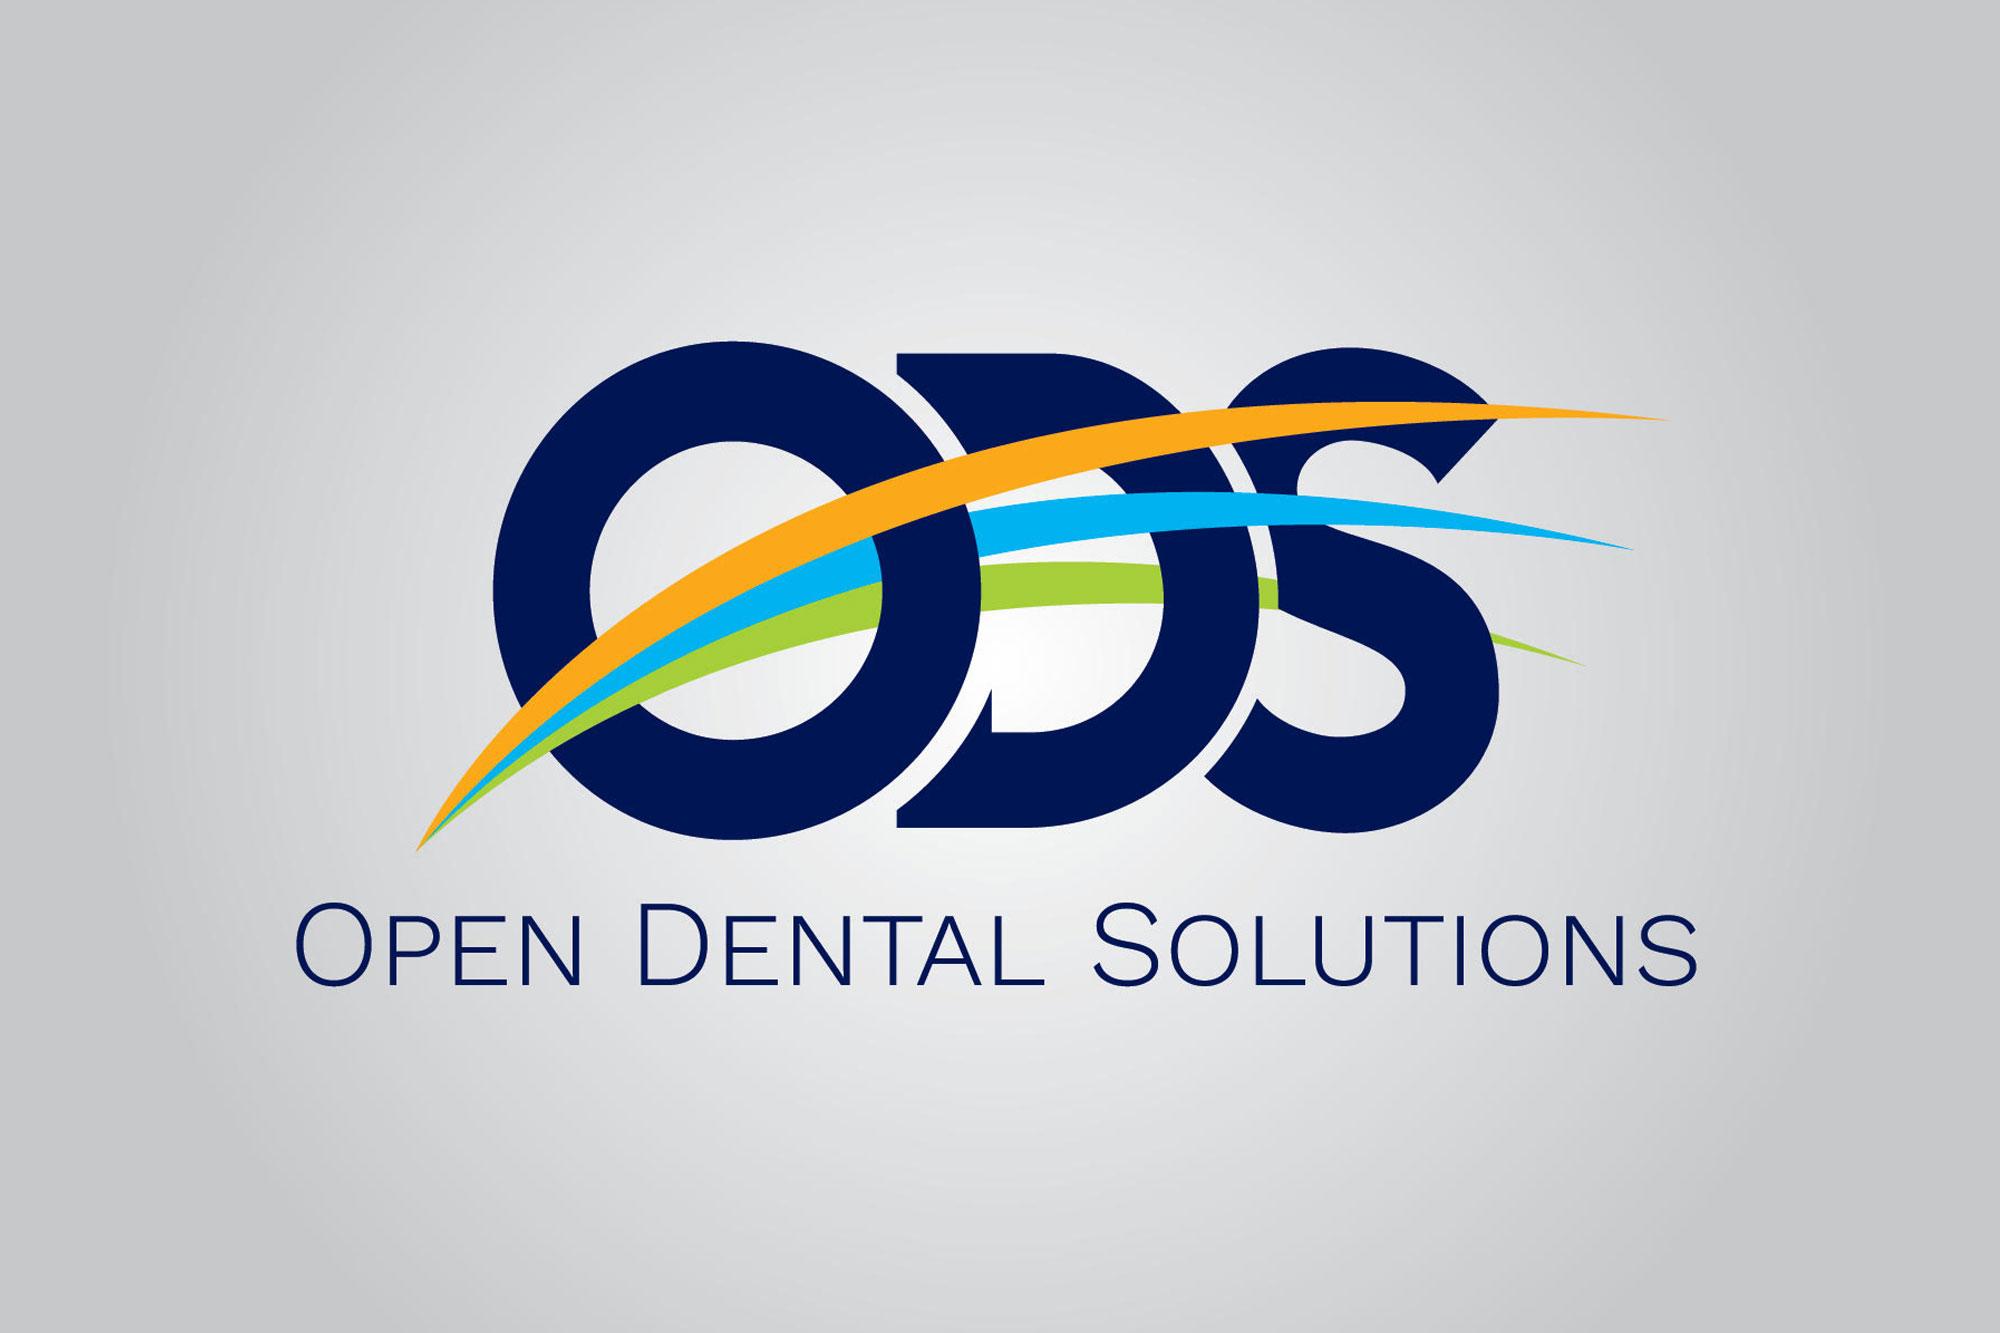 Open Dental Solutions